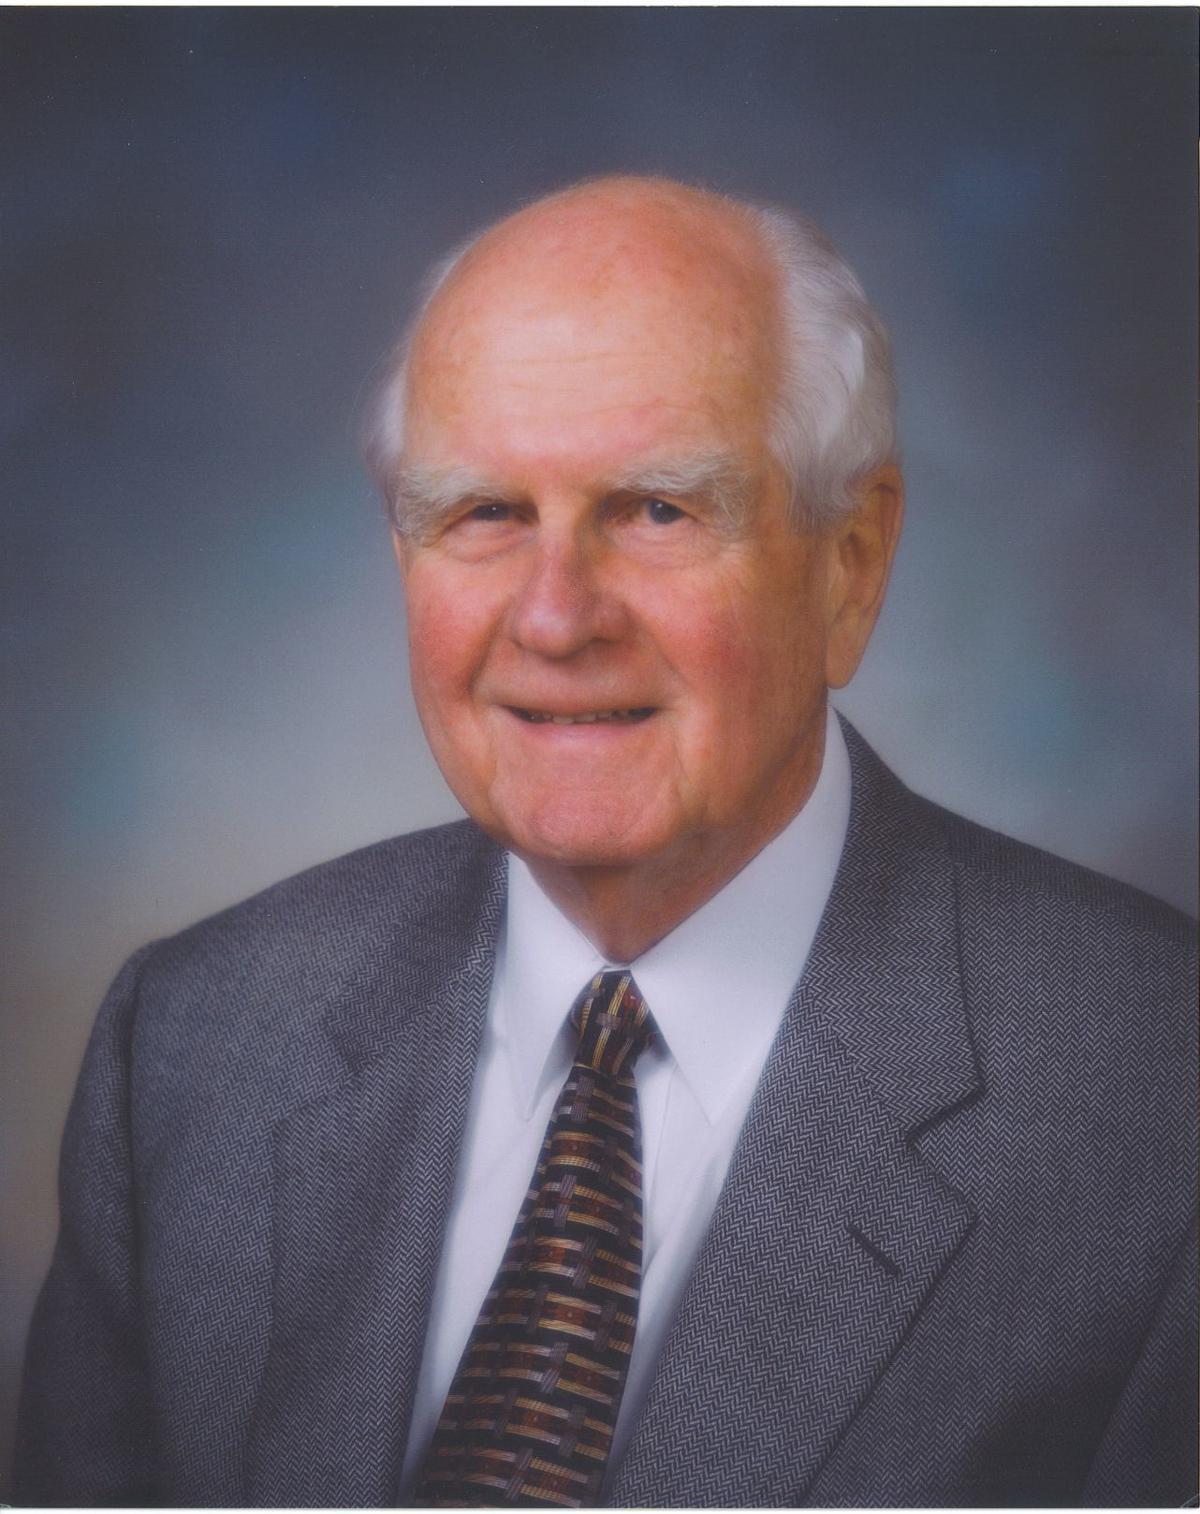 R. Boykin Curry, Lifetime Philanthropy Award Winner